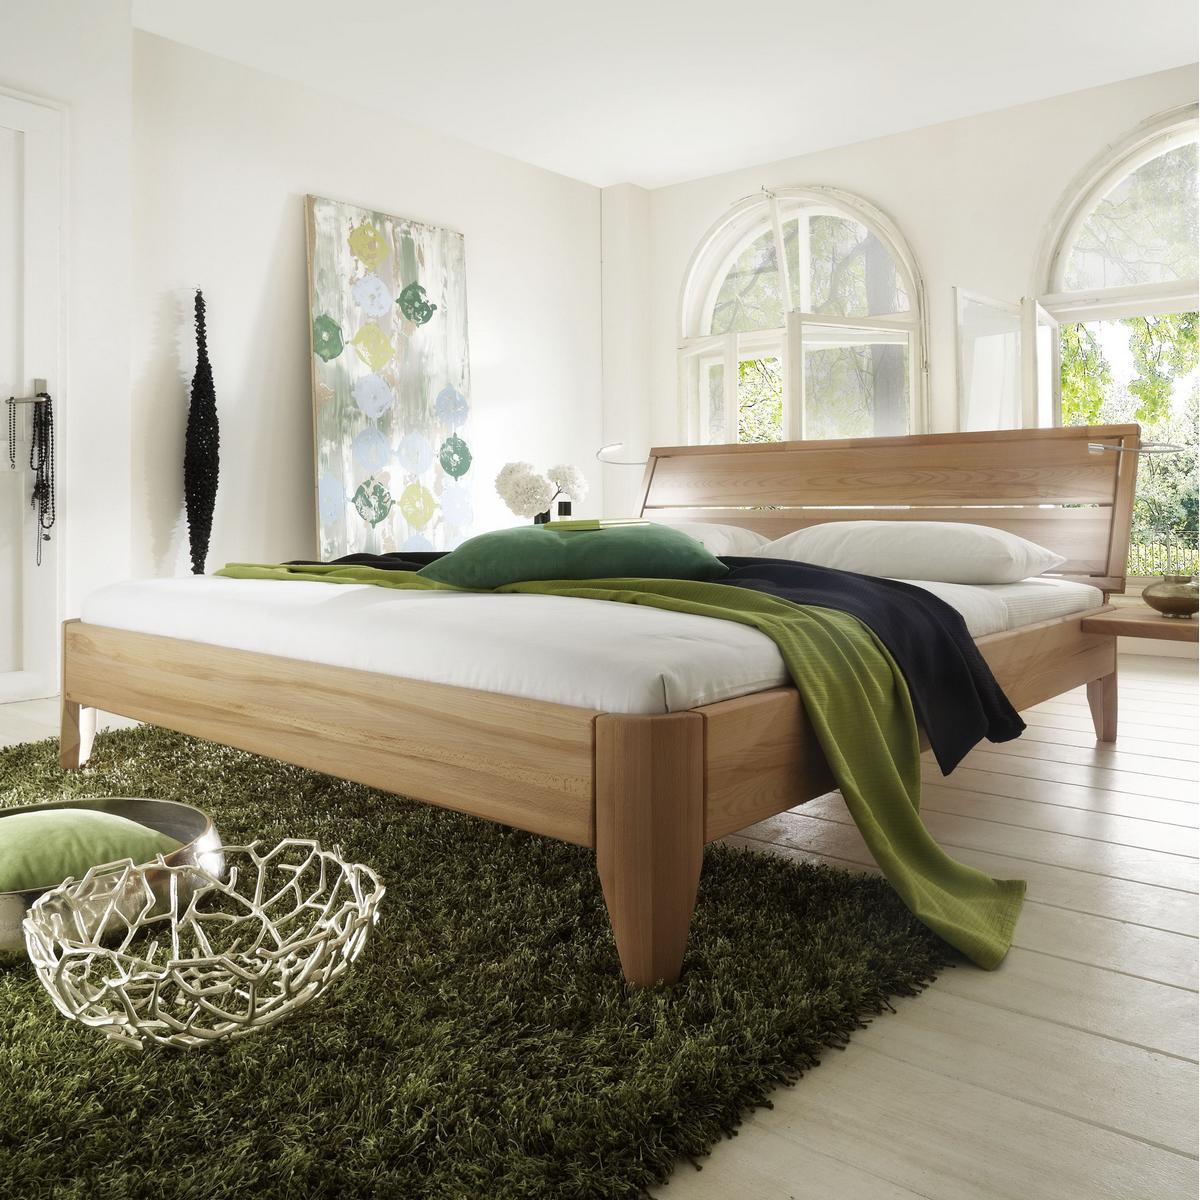 Massivholz bett 120x200 easy sleep kernbuche massiv ge lt for Einzelbett 120x200